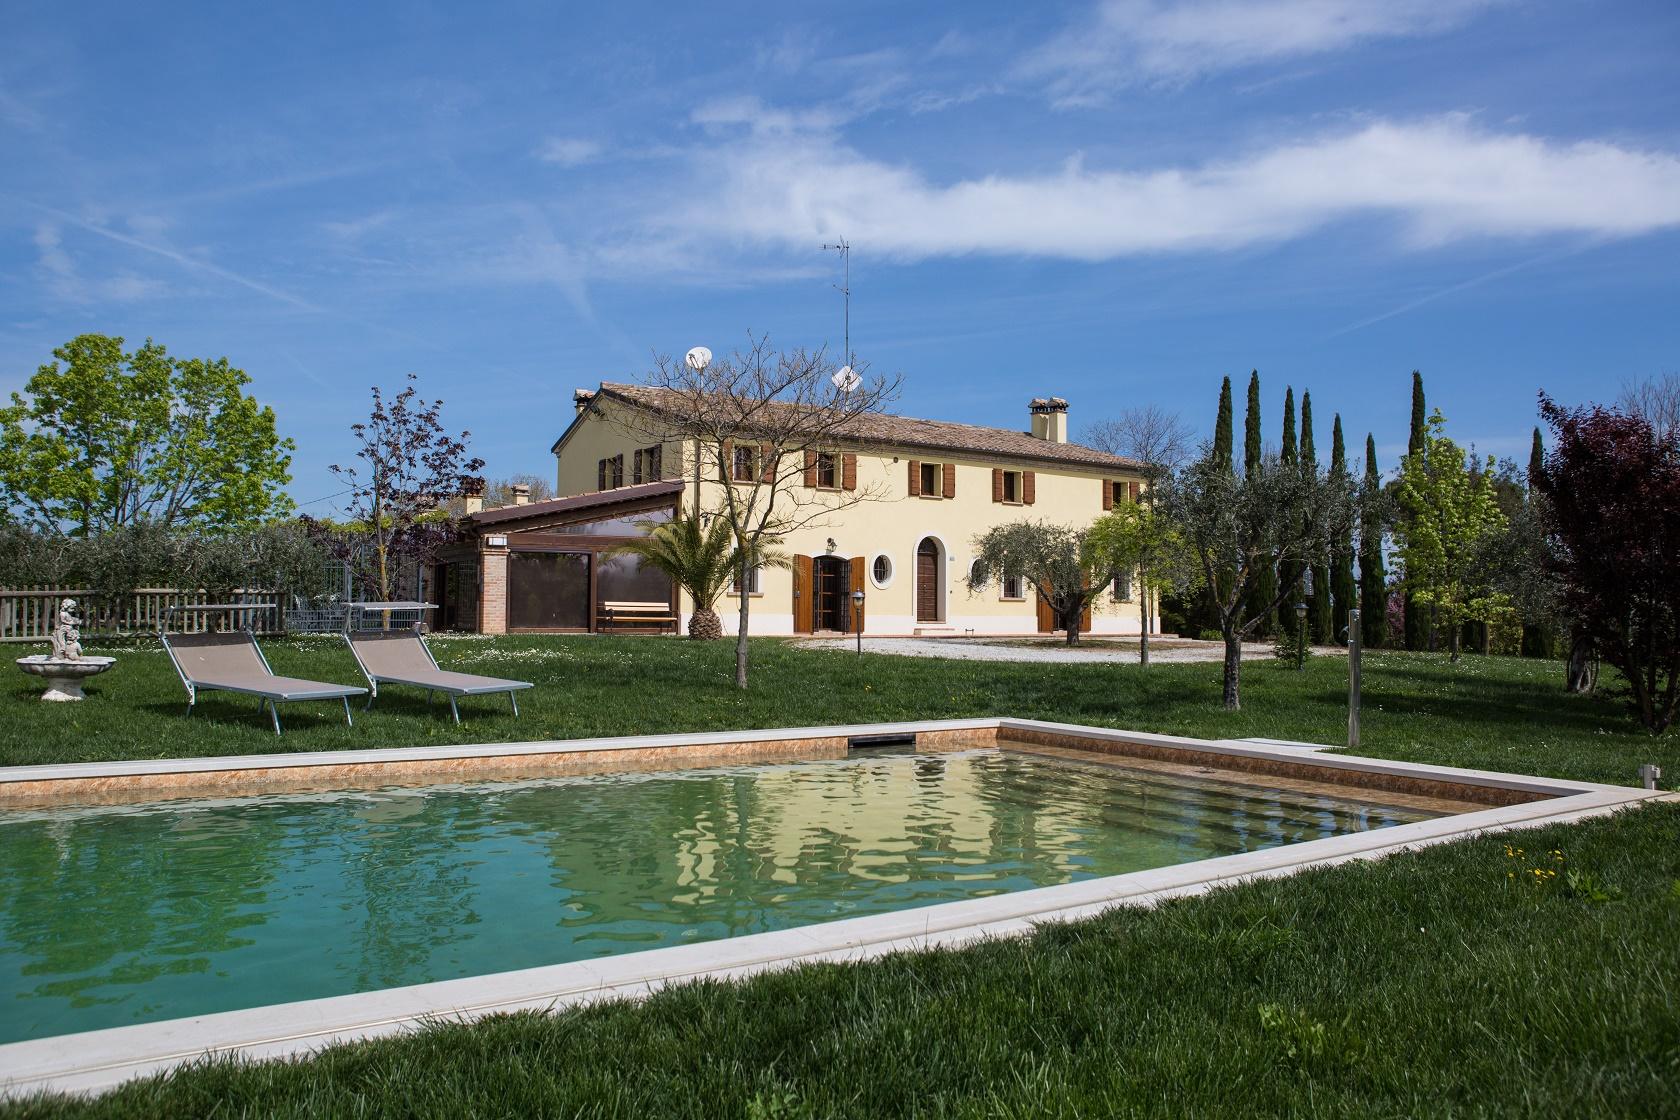 ITALIA,  REGION Emilia Romagna, edles  GUTSHAUS mit 2 Apartments, Garten, Swimming pool und OLIVENHAIN, Provinz Rimini, SAN GIOVANNI i.M. , ca 7km vom MEER